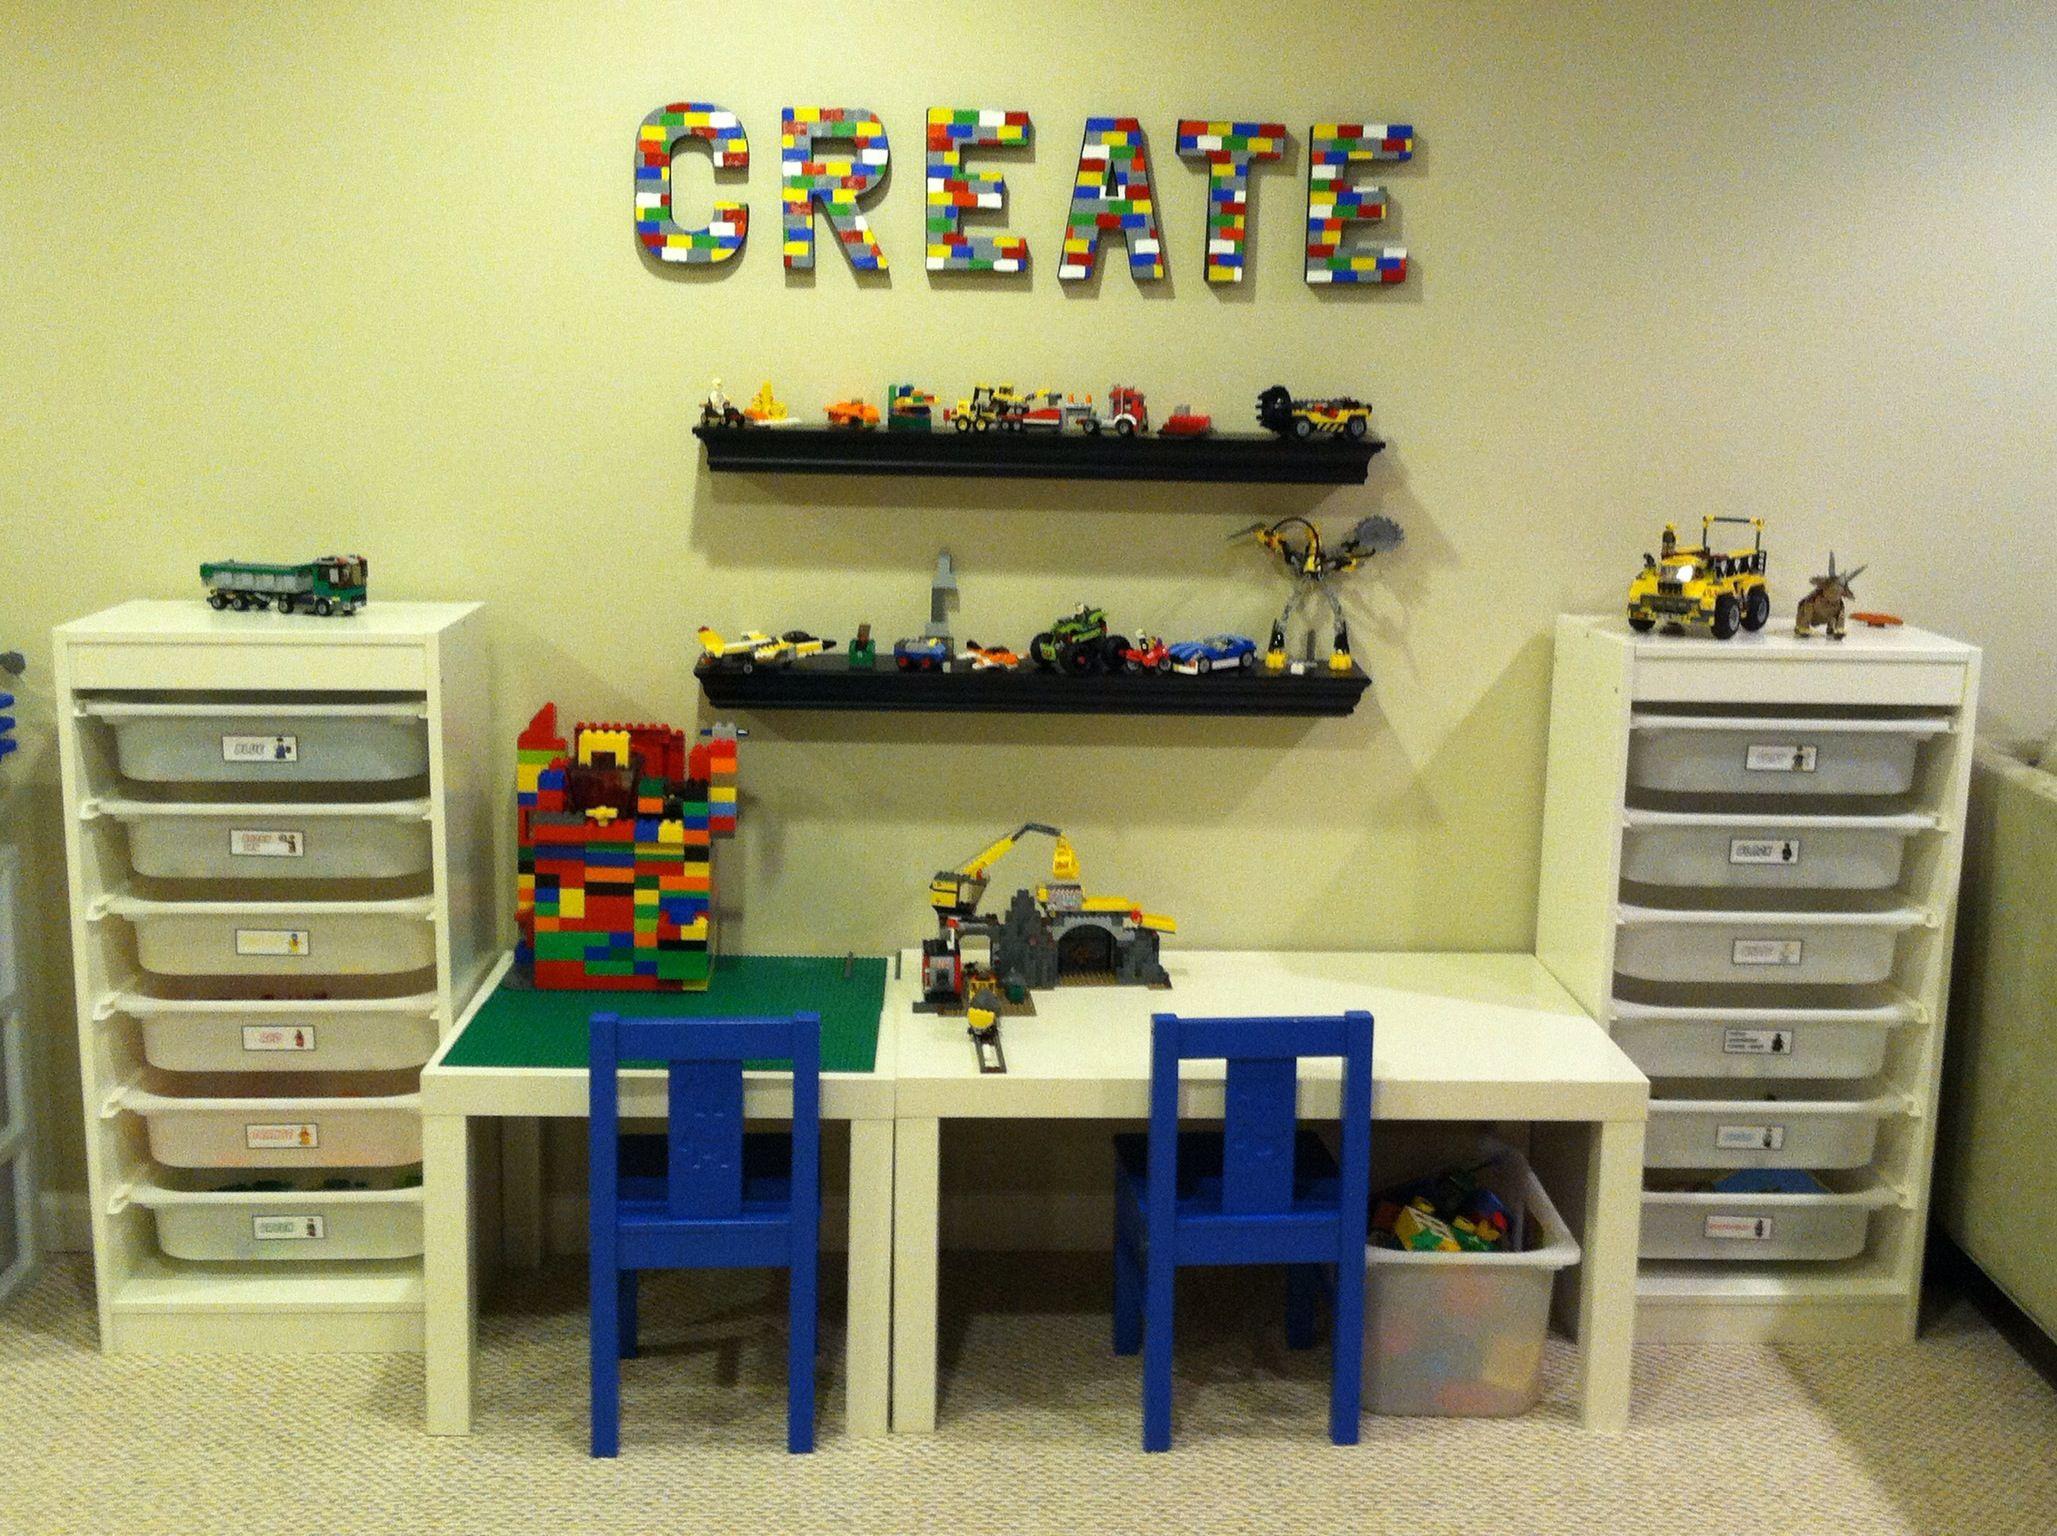 Lego Station Lego Bedroom Lego Station Lego Room